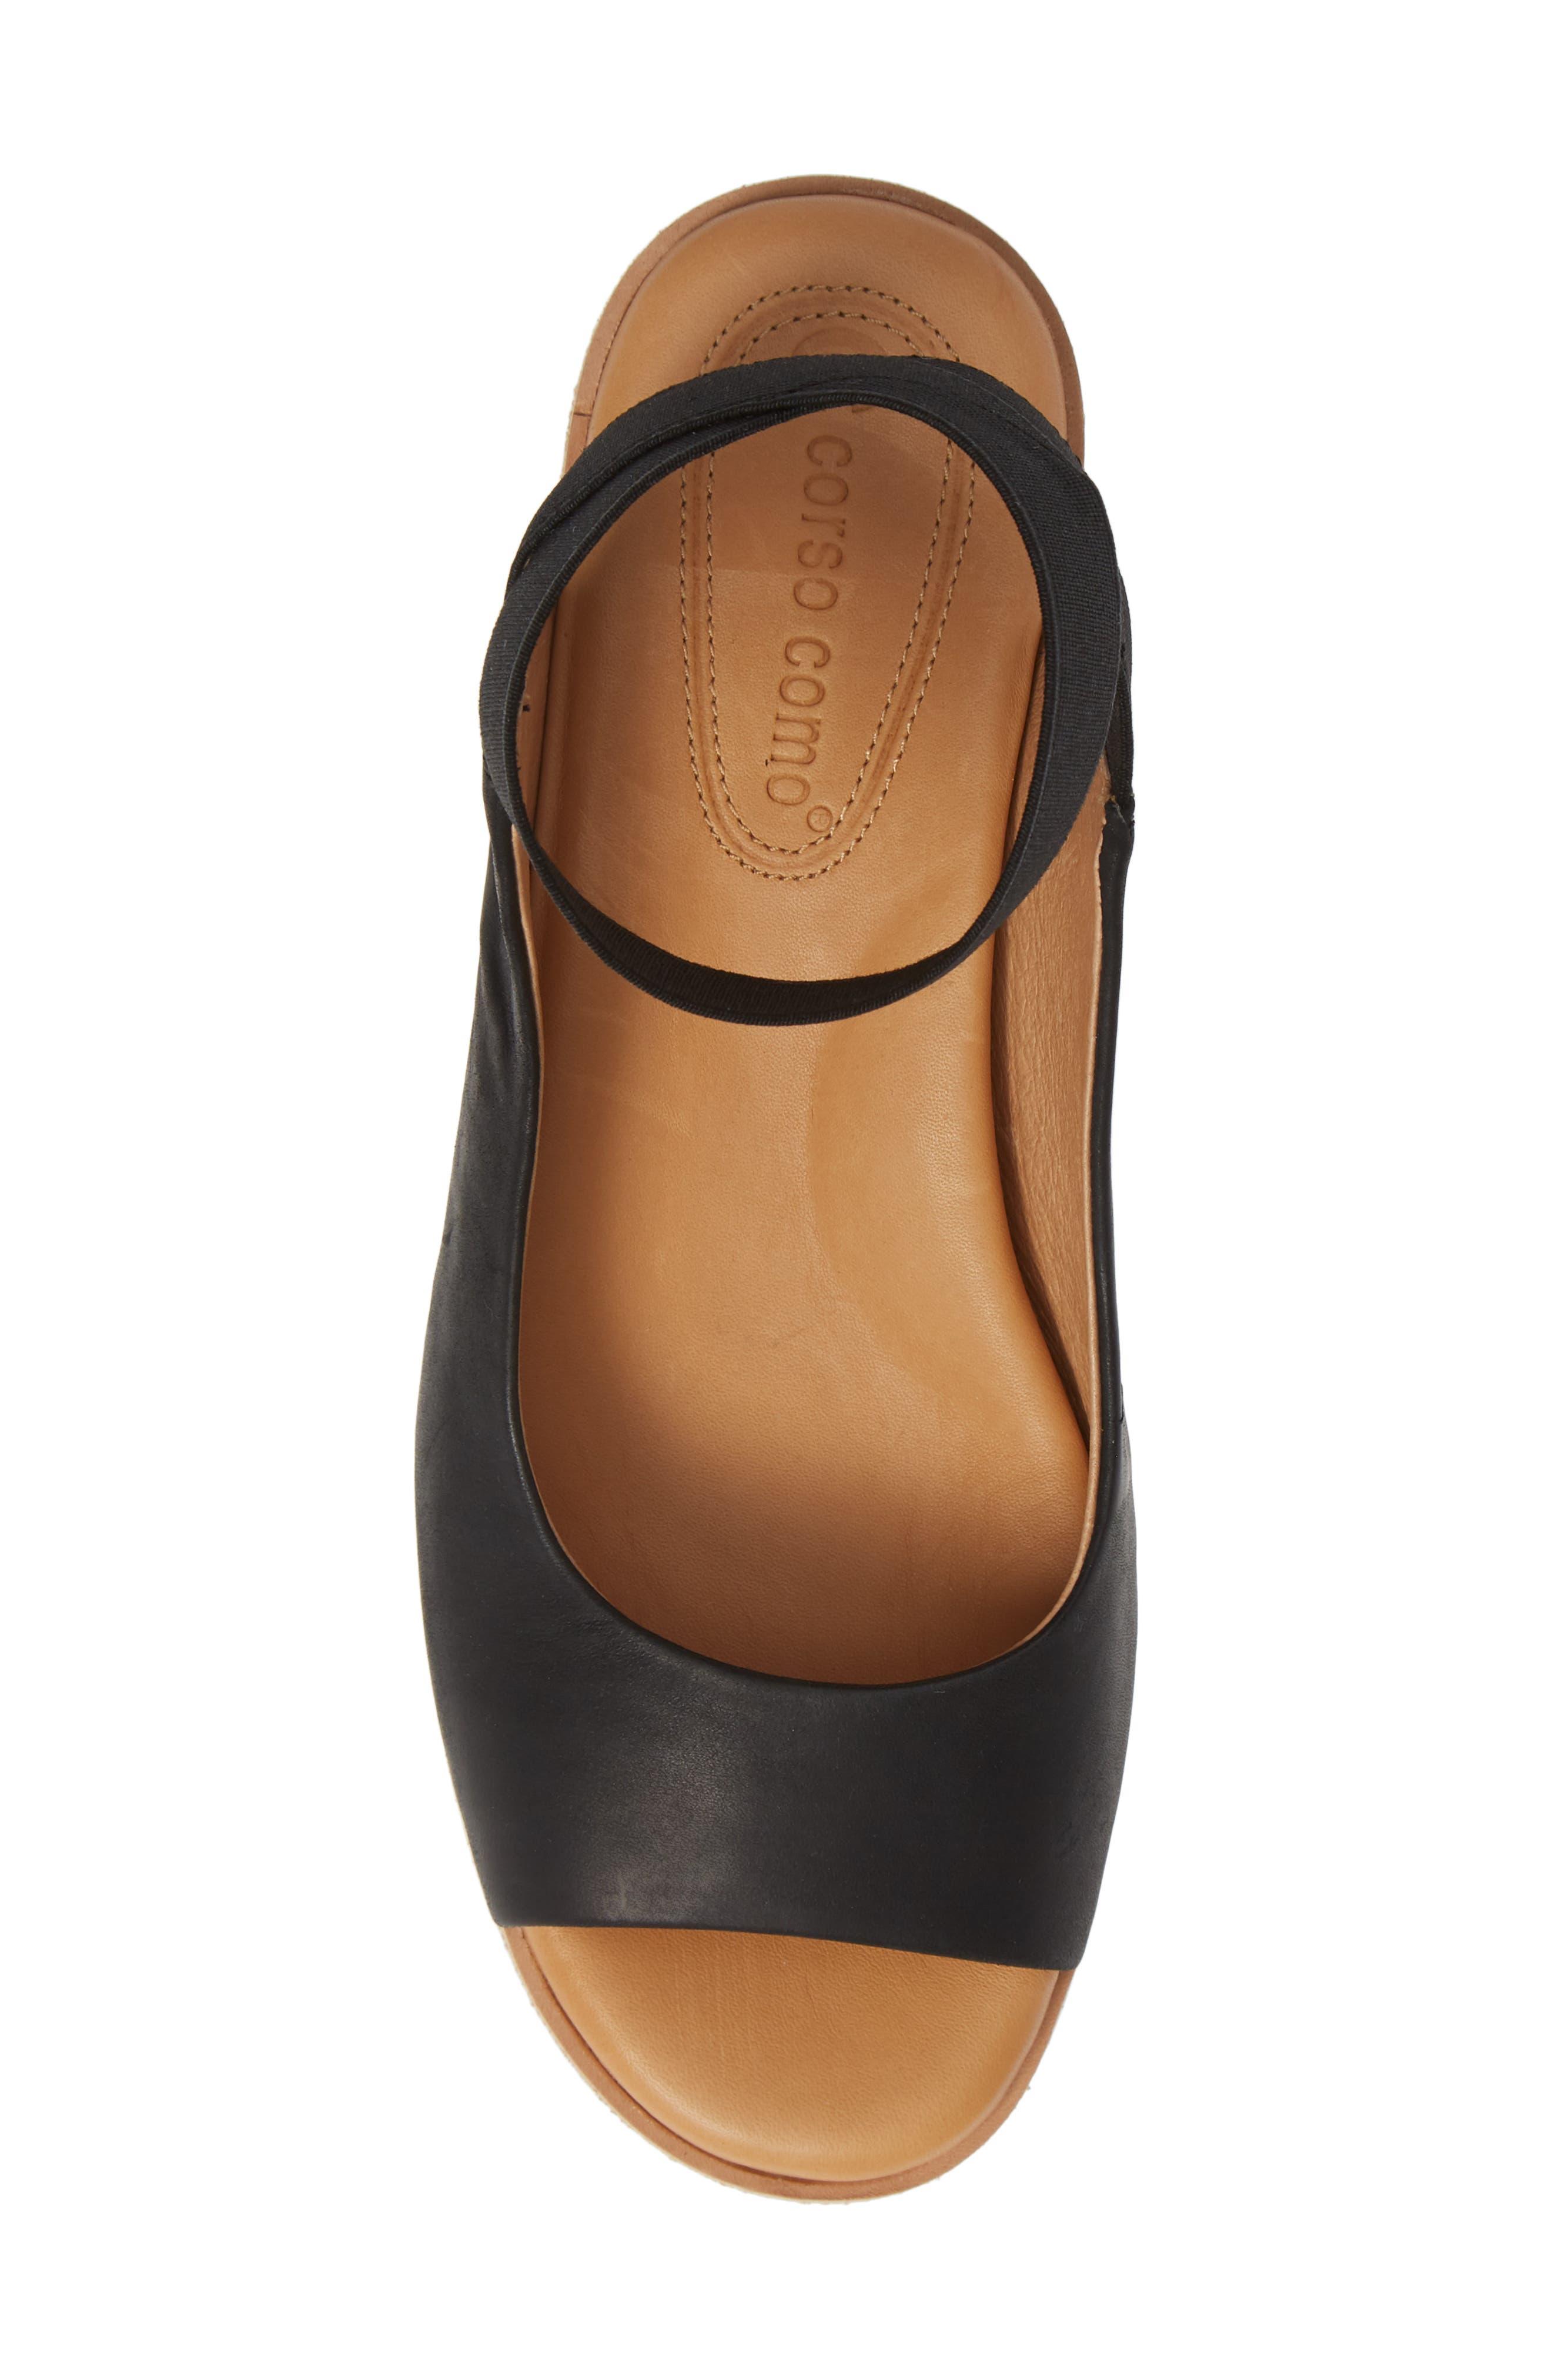 Beeata Wedge Sandal,                             Alternate thumbnail 5, color,                             BLACK LEATHER